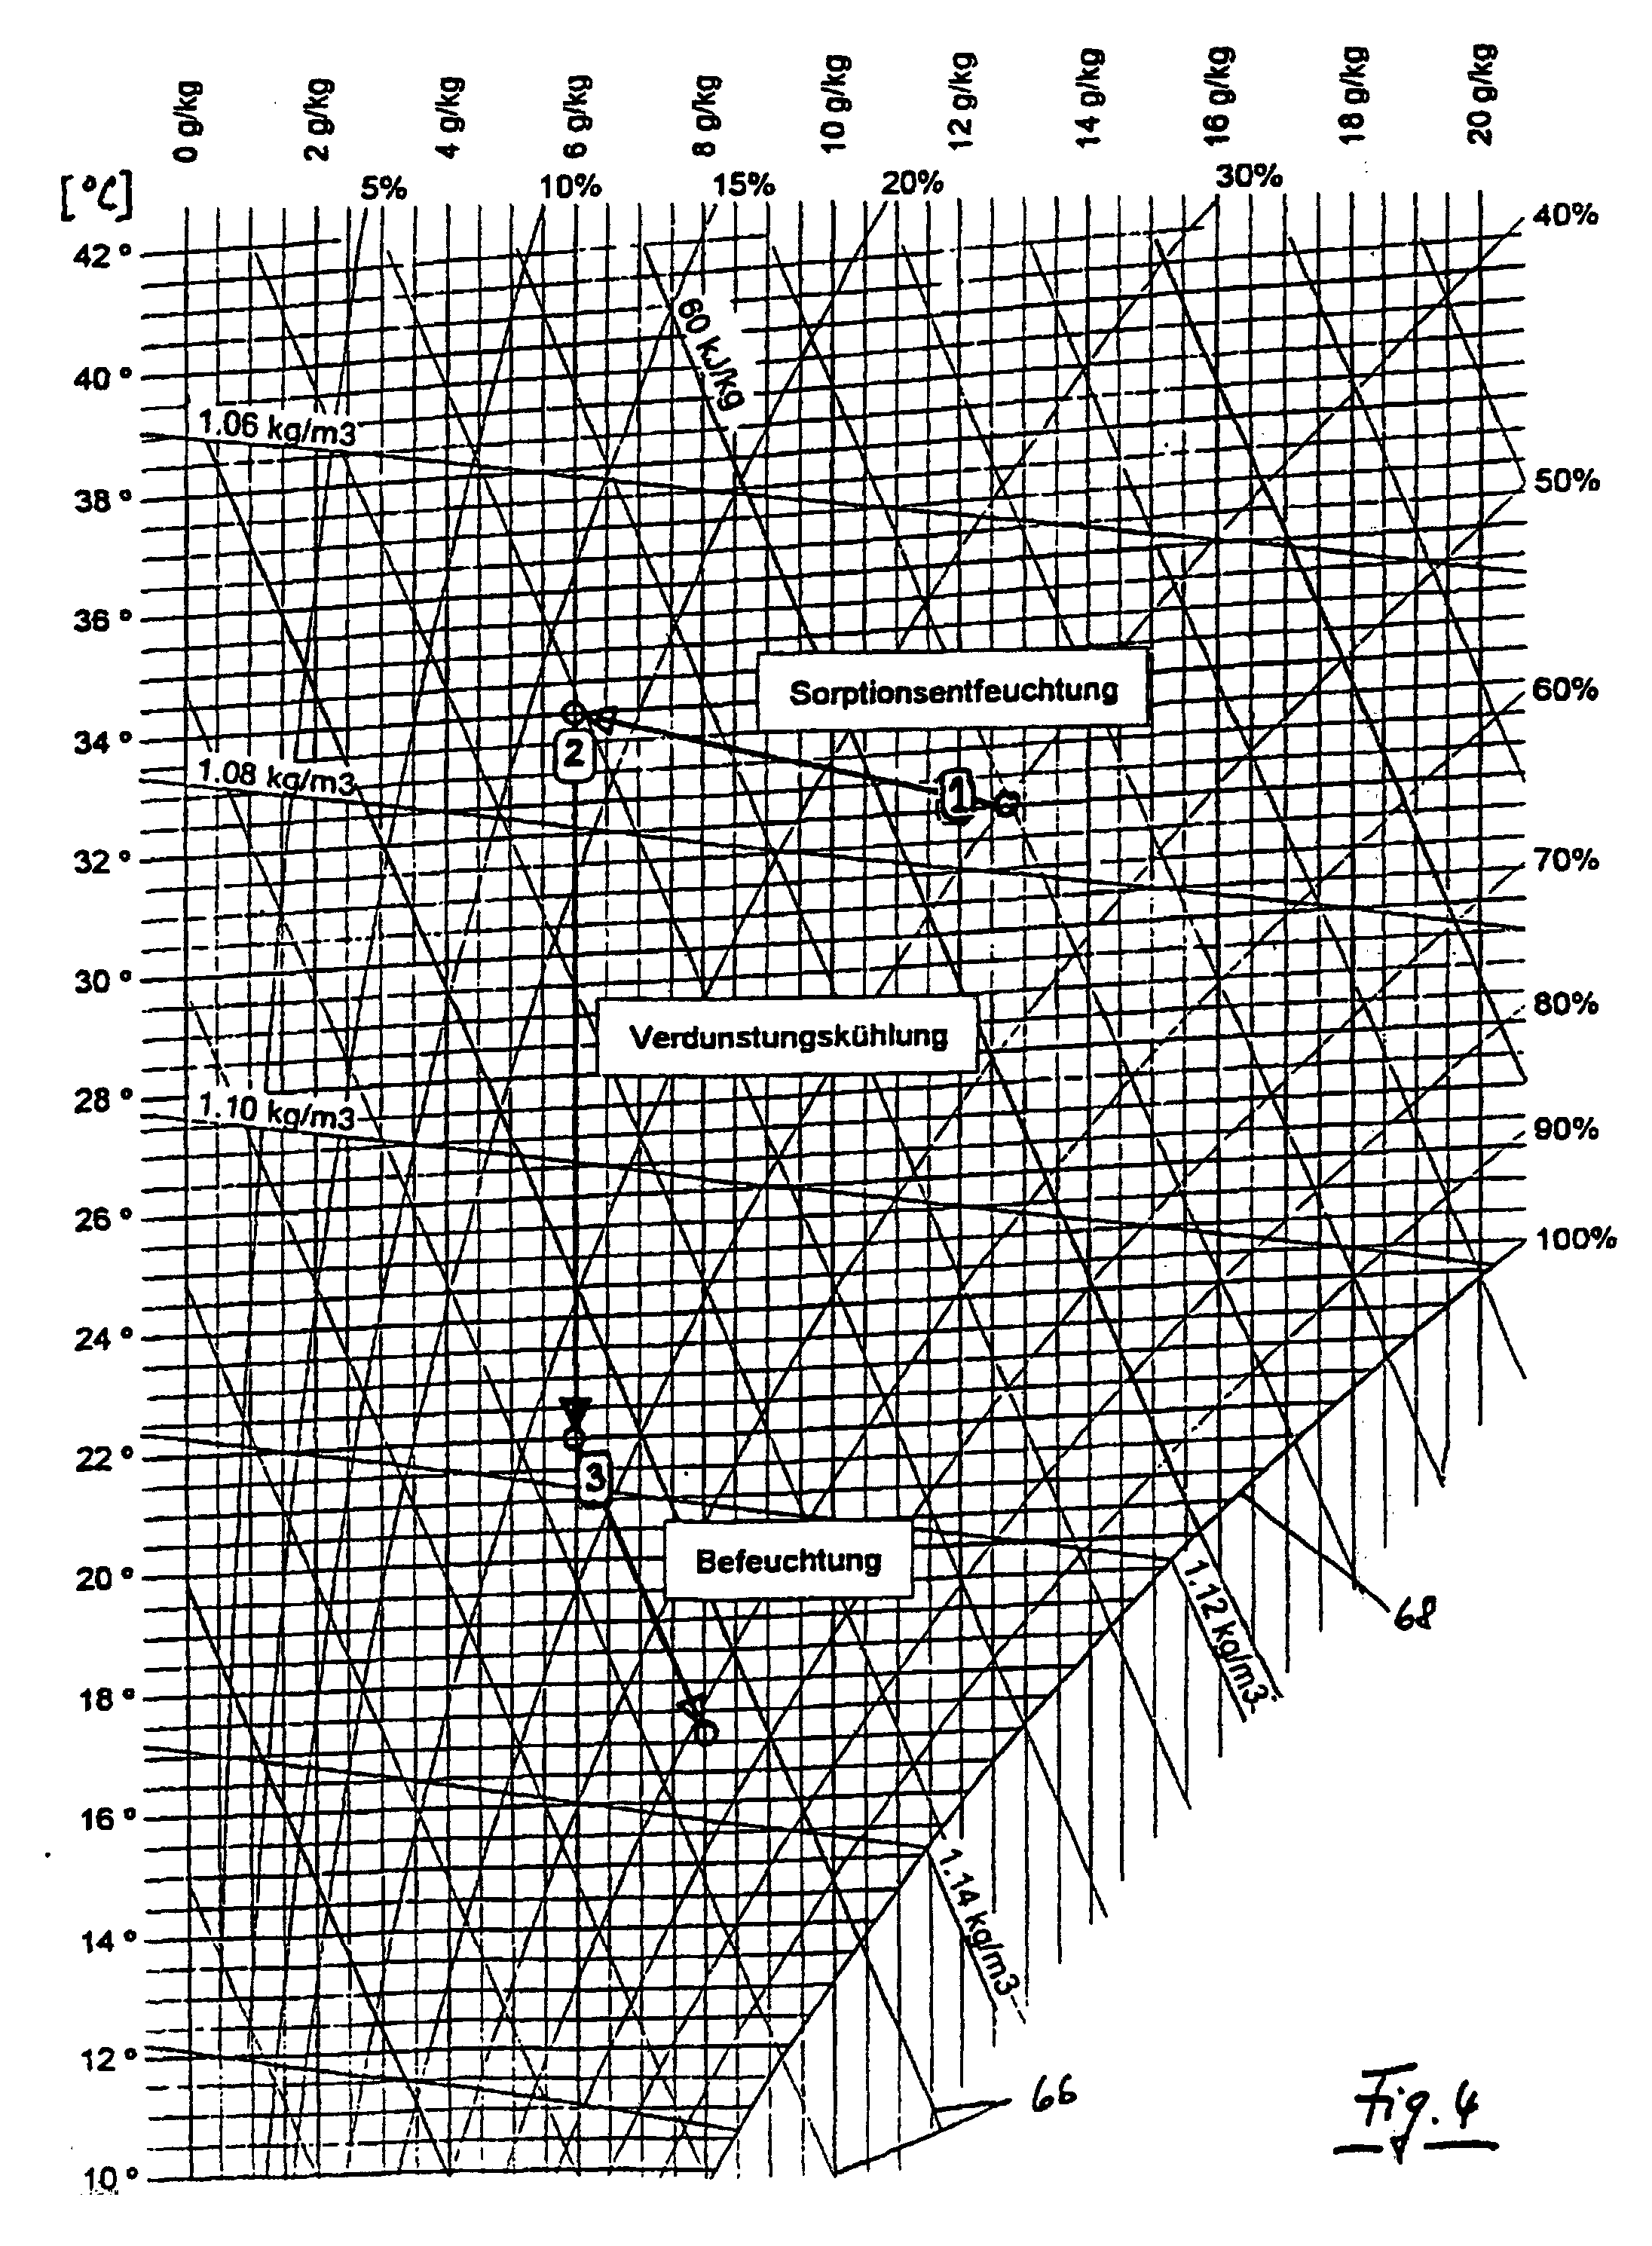 mollier hx diagramm download timesradio gq. Black Bedroom Furniture Sets. Home Design Ideas